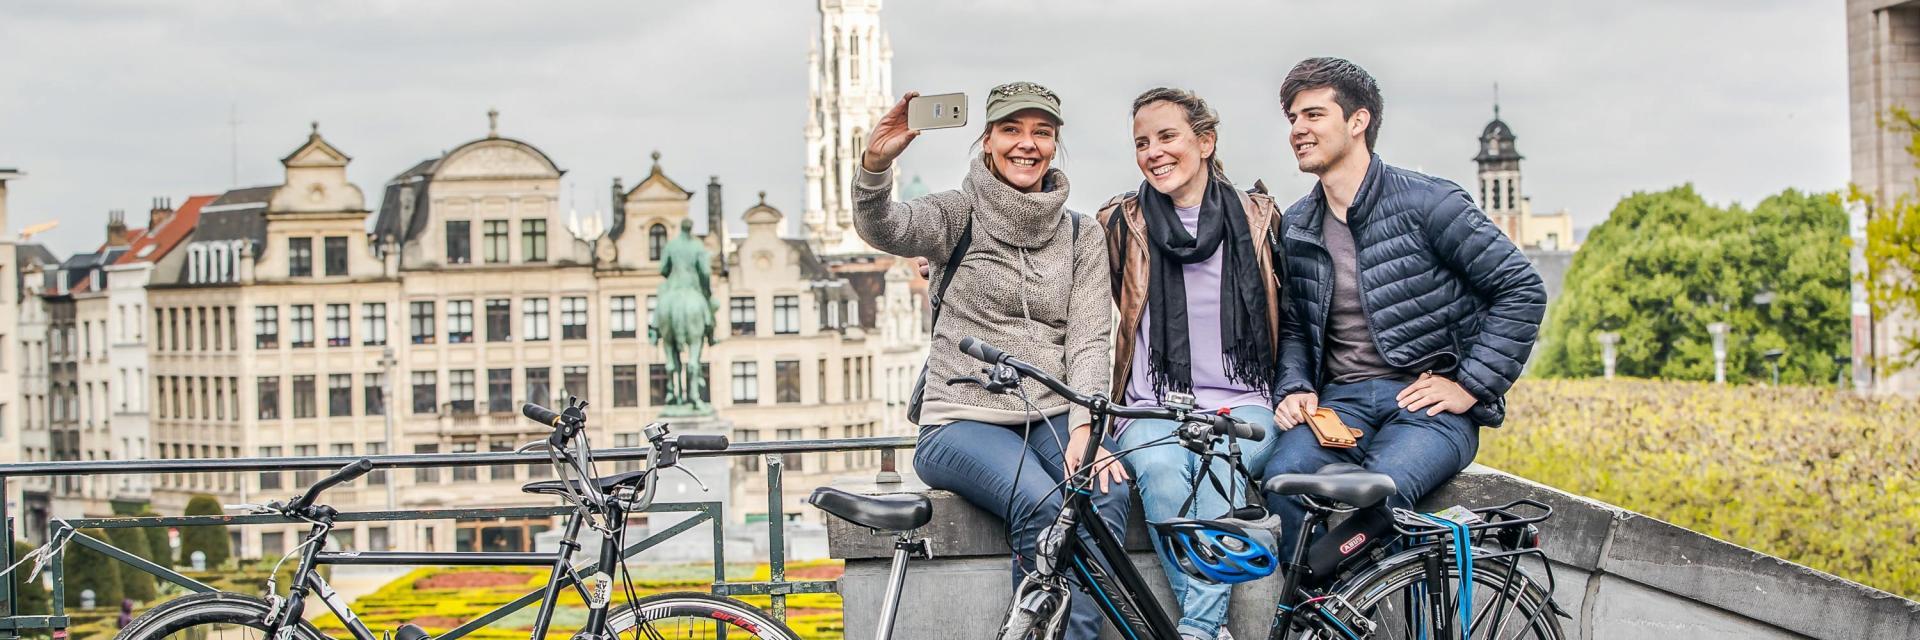 Mont des Arts - KunstbergSquare - Brussels Meeting Centrevélo - fiets - bike© visit.brussels - Eric Danhier - 2017